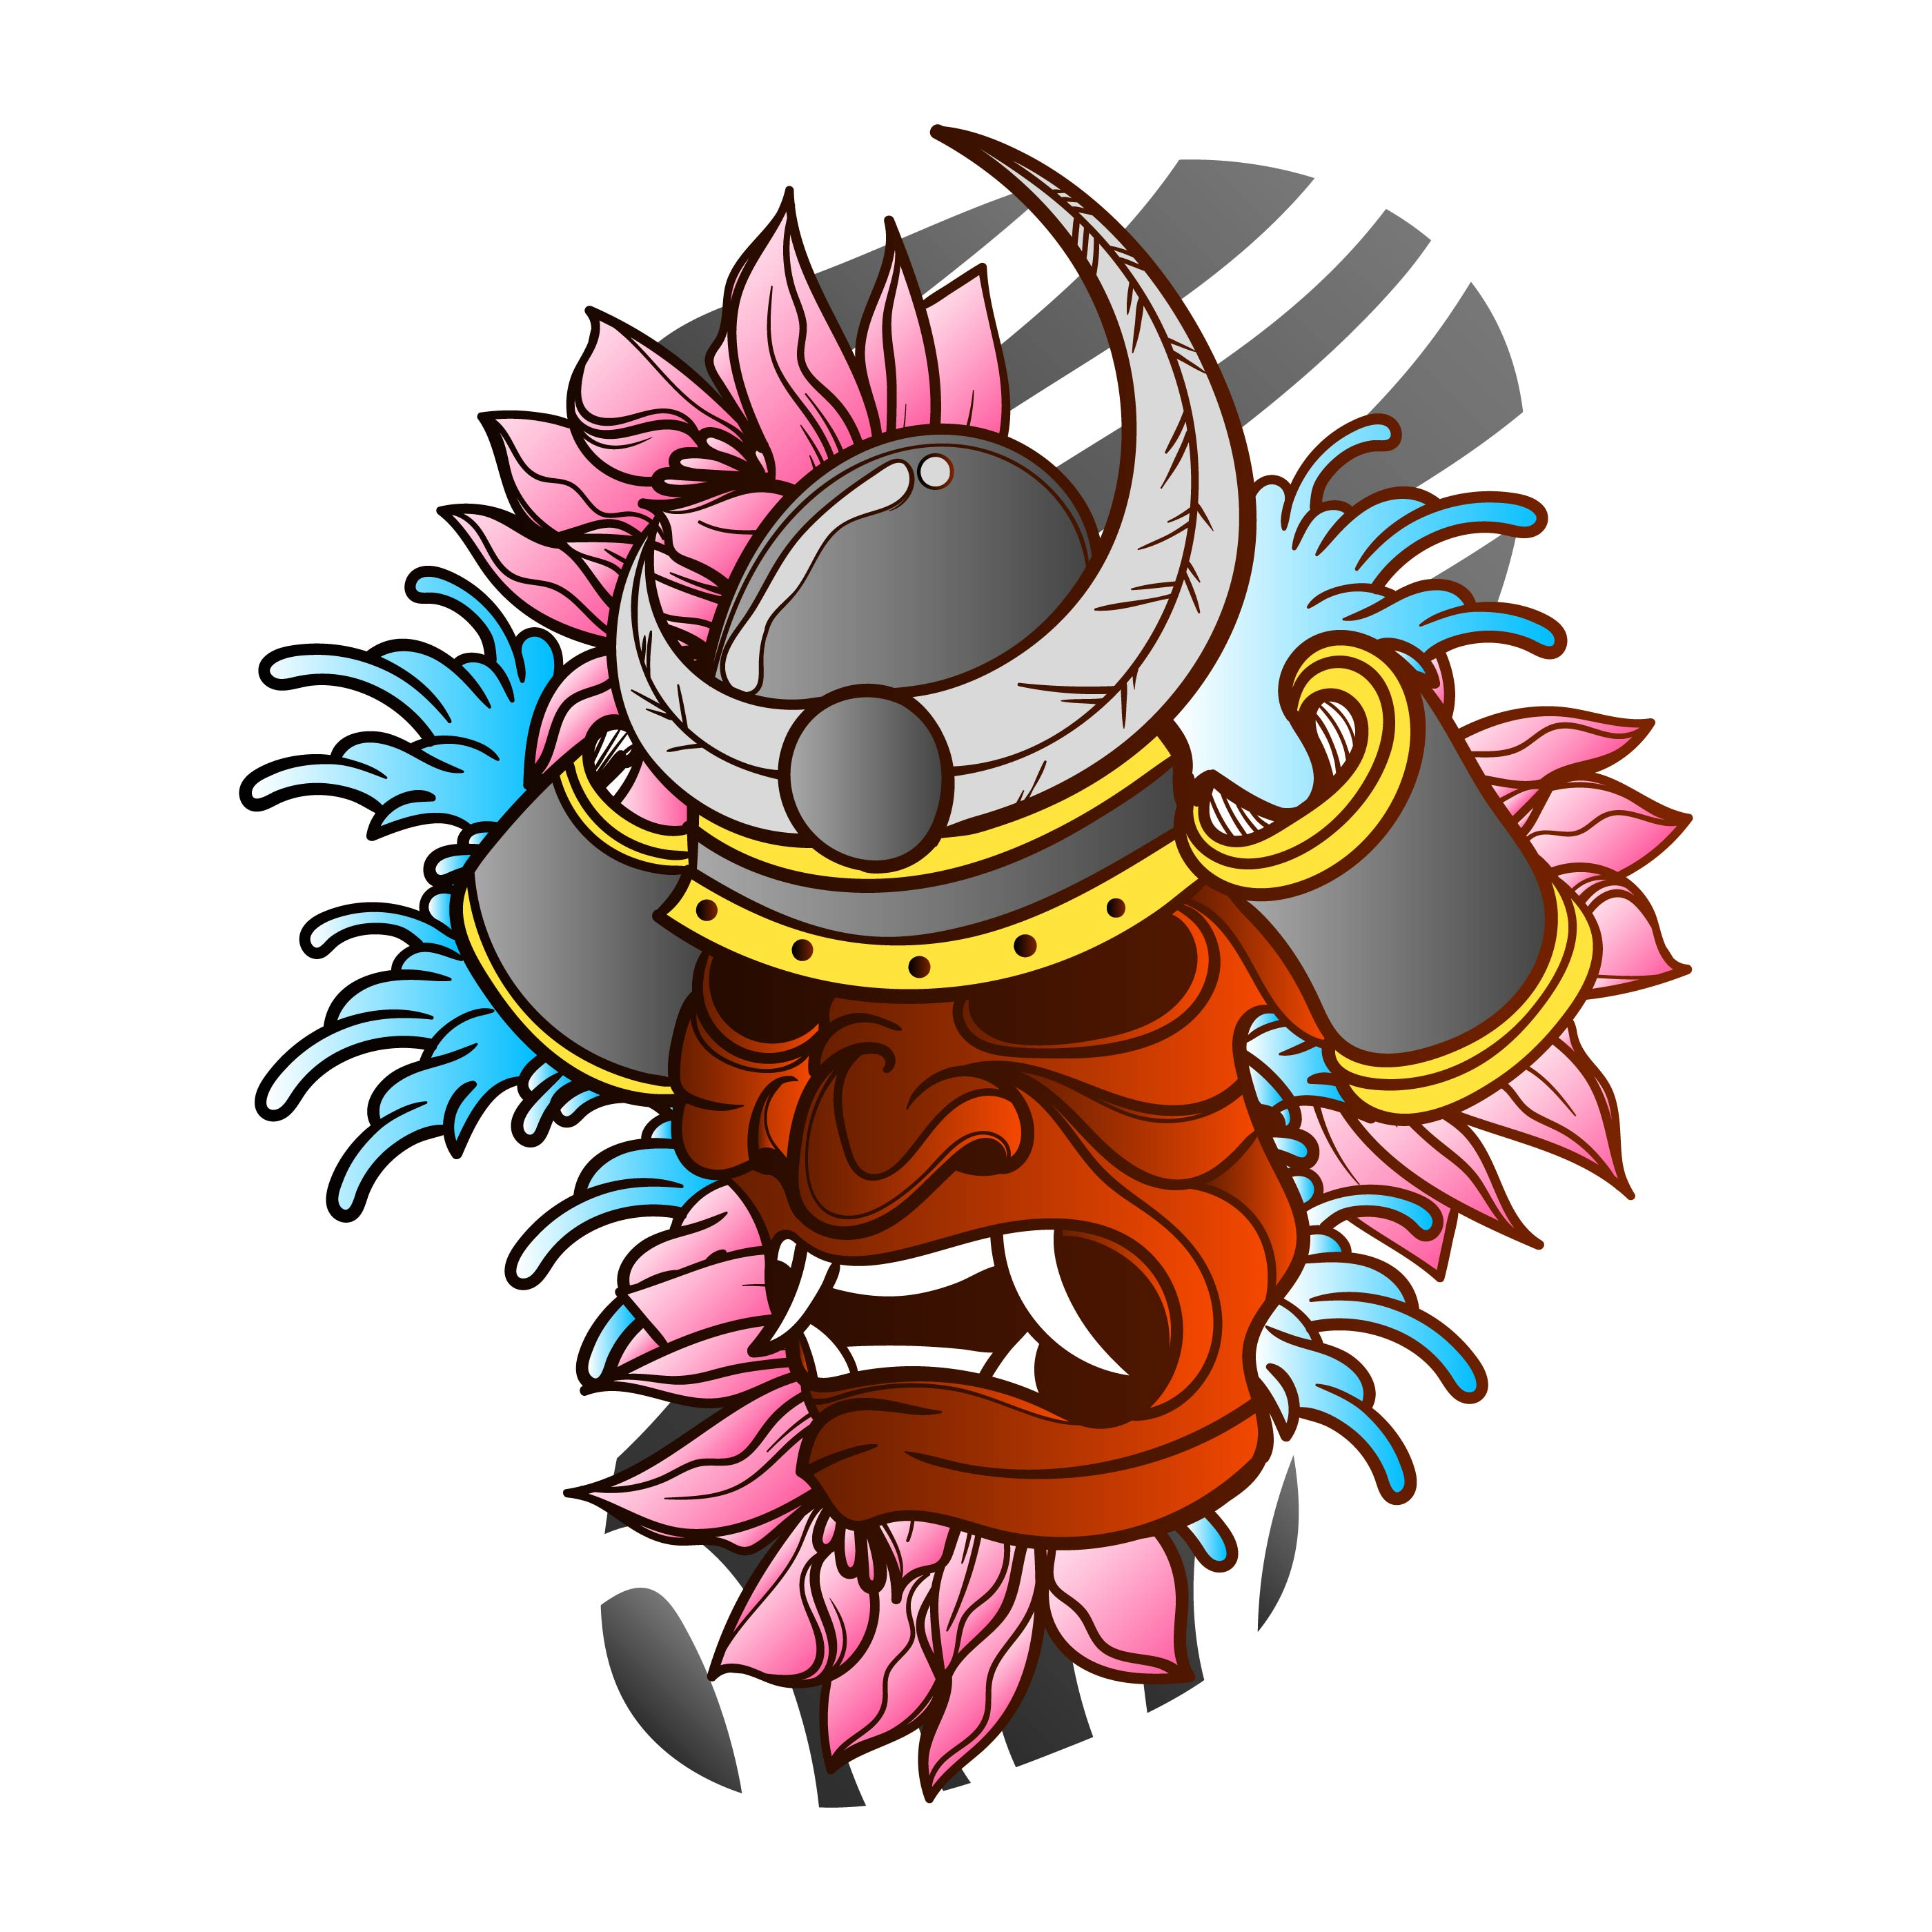 Samurai Mask Free Vector Art 10 837 Free Downloads